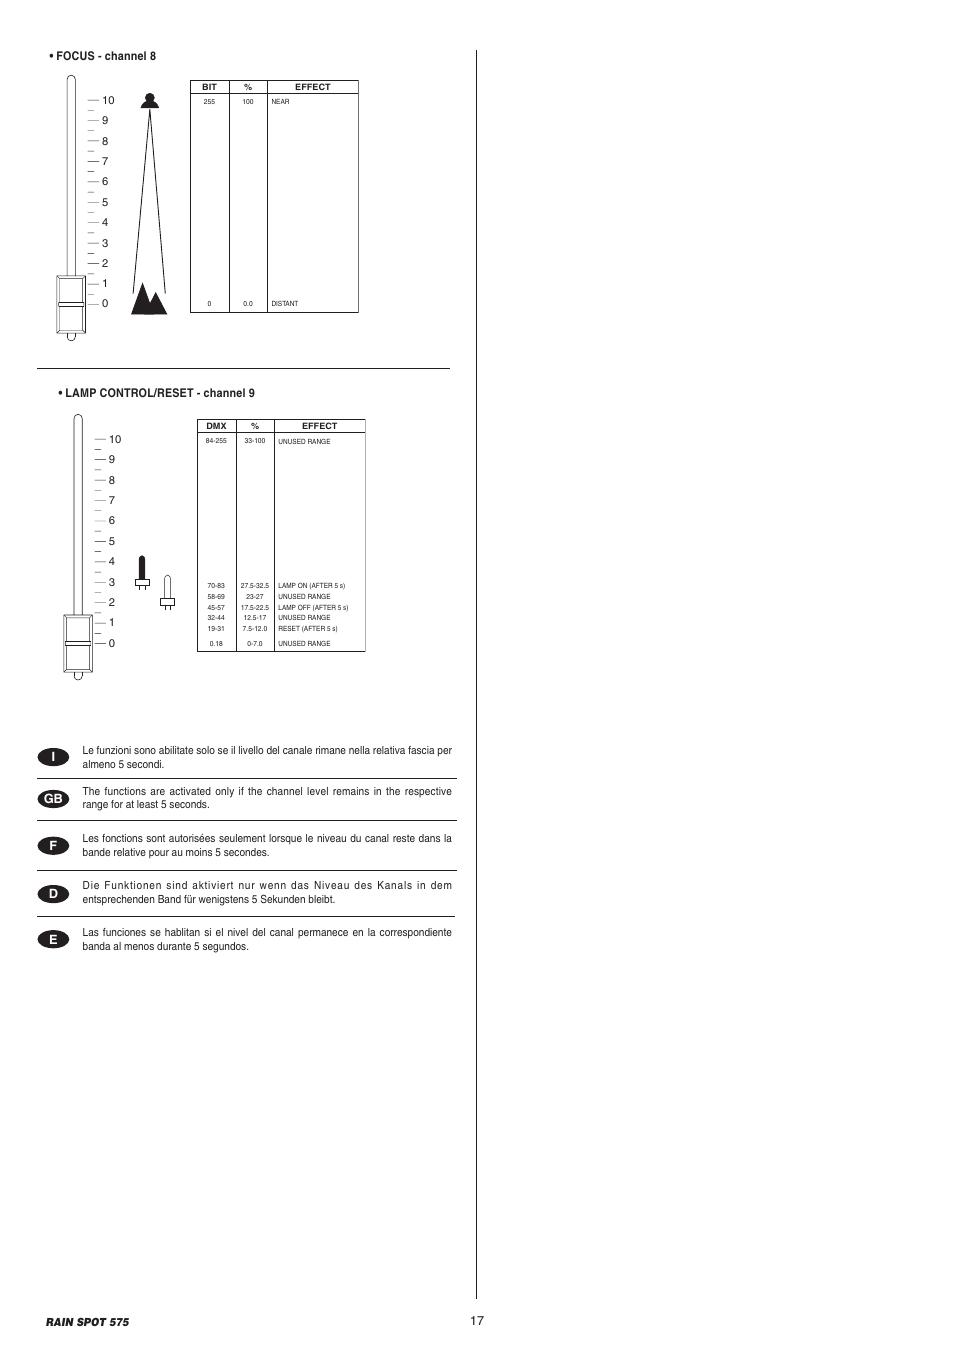 clay paky rain spot 575 msr 575w user manual page 17 24 rh manualsdir com spot gen3 user manual webbing spot user manual